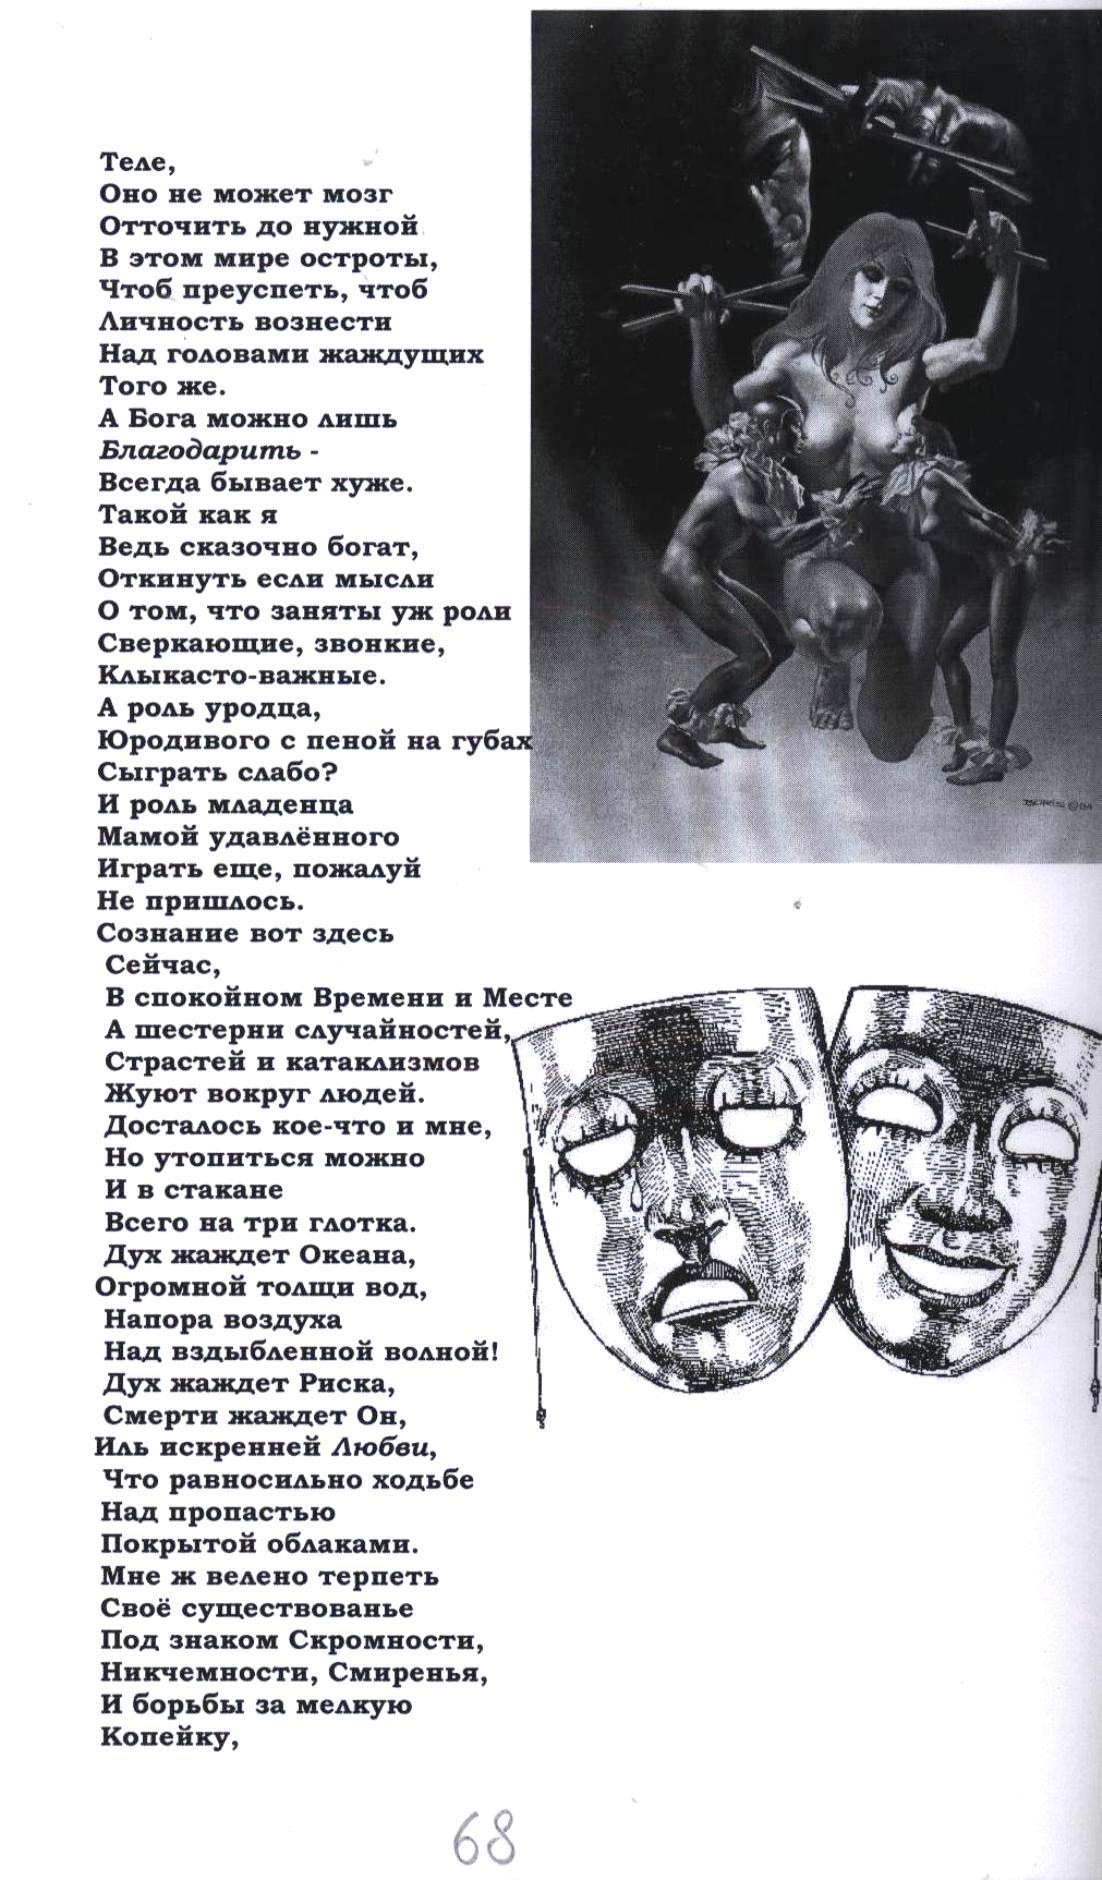 Стихи 067.jpg